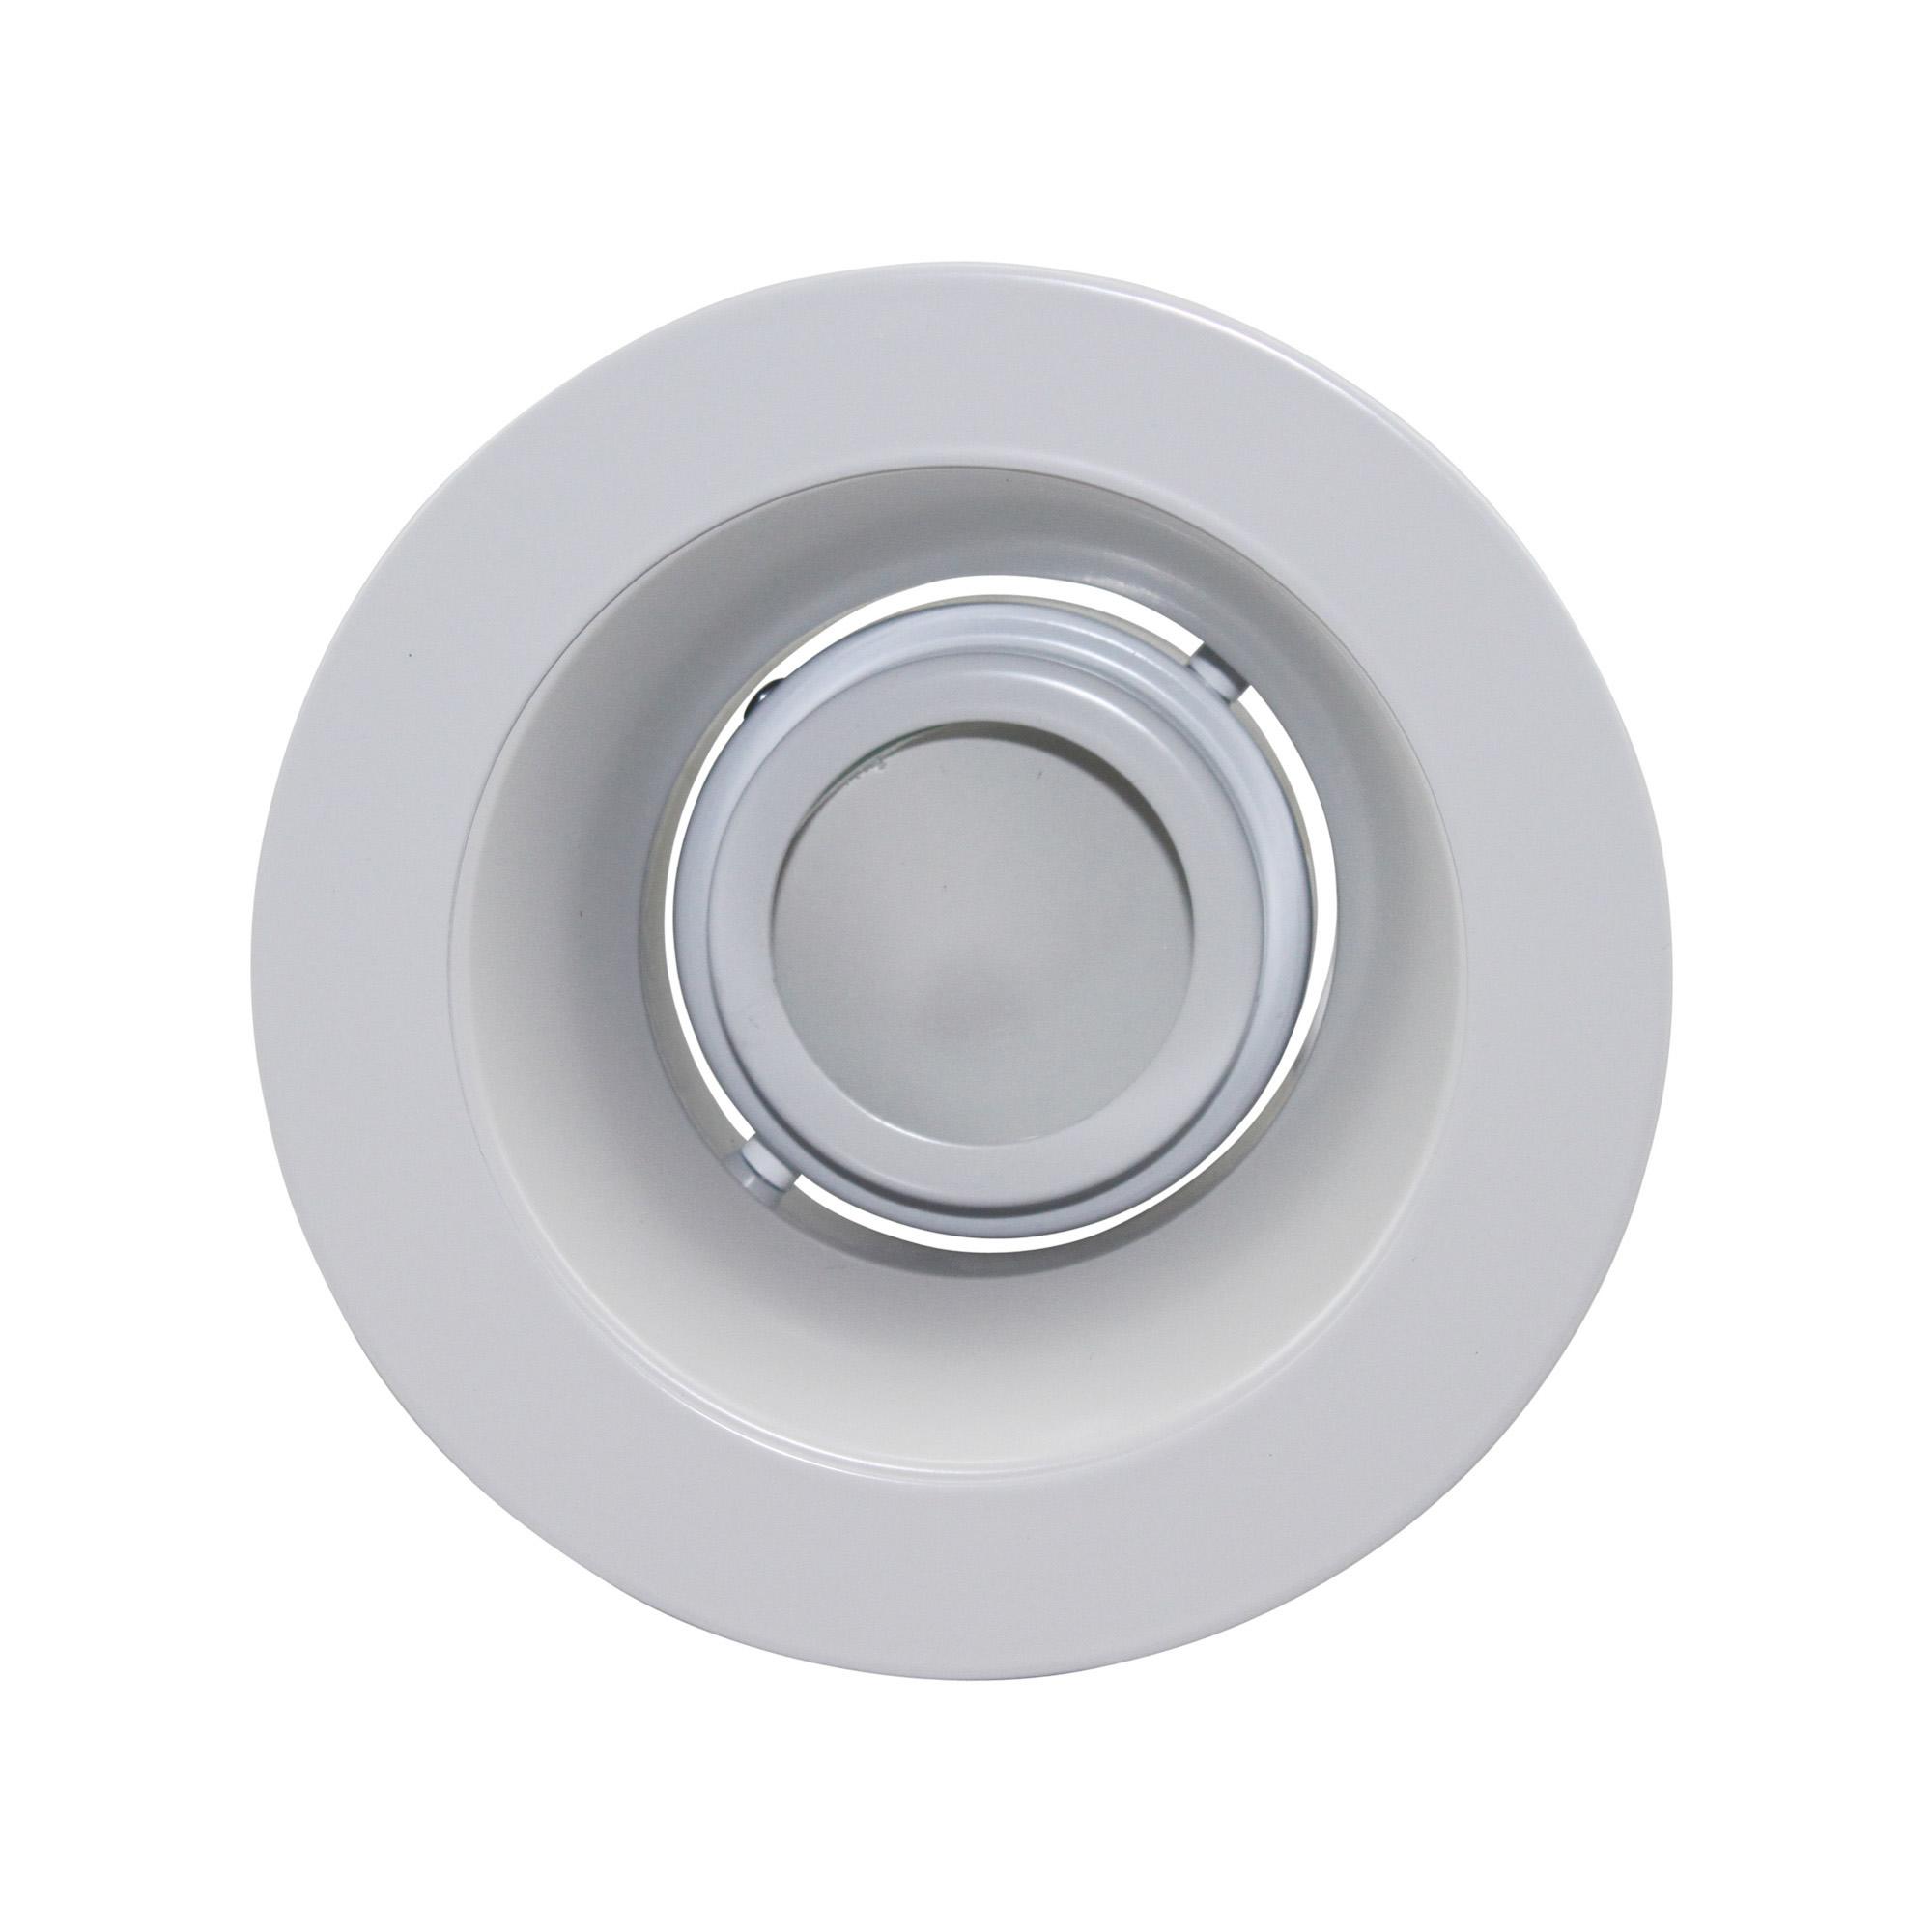 Capri lighting p4lr 4 white reflector miniature tilt for Number of recessed lights per room